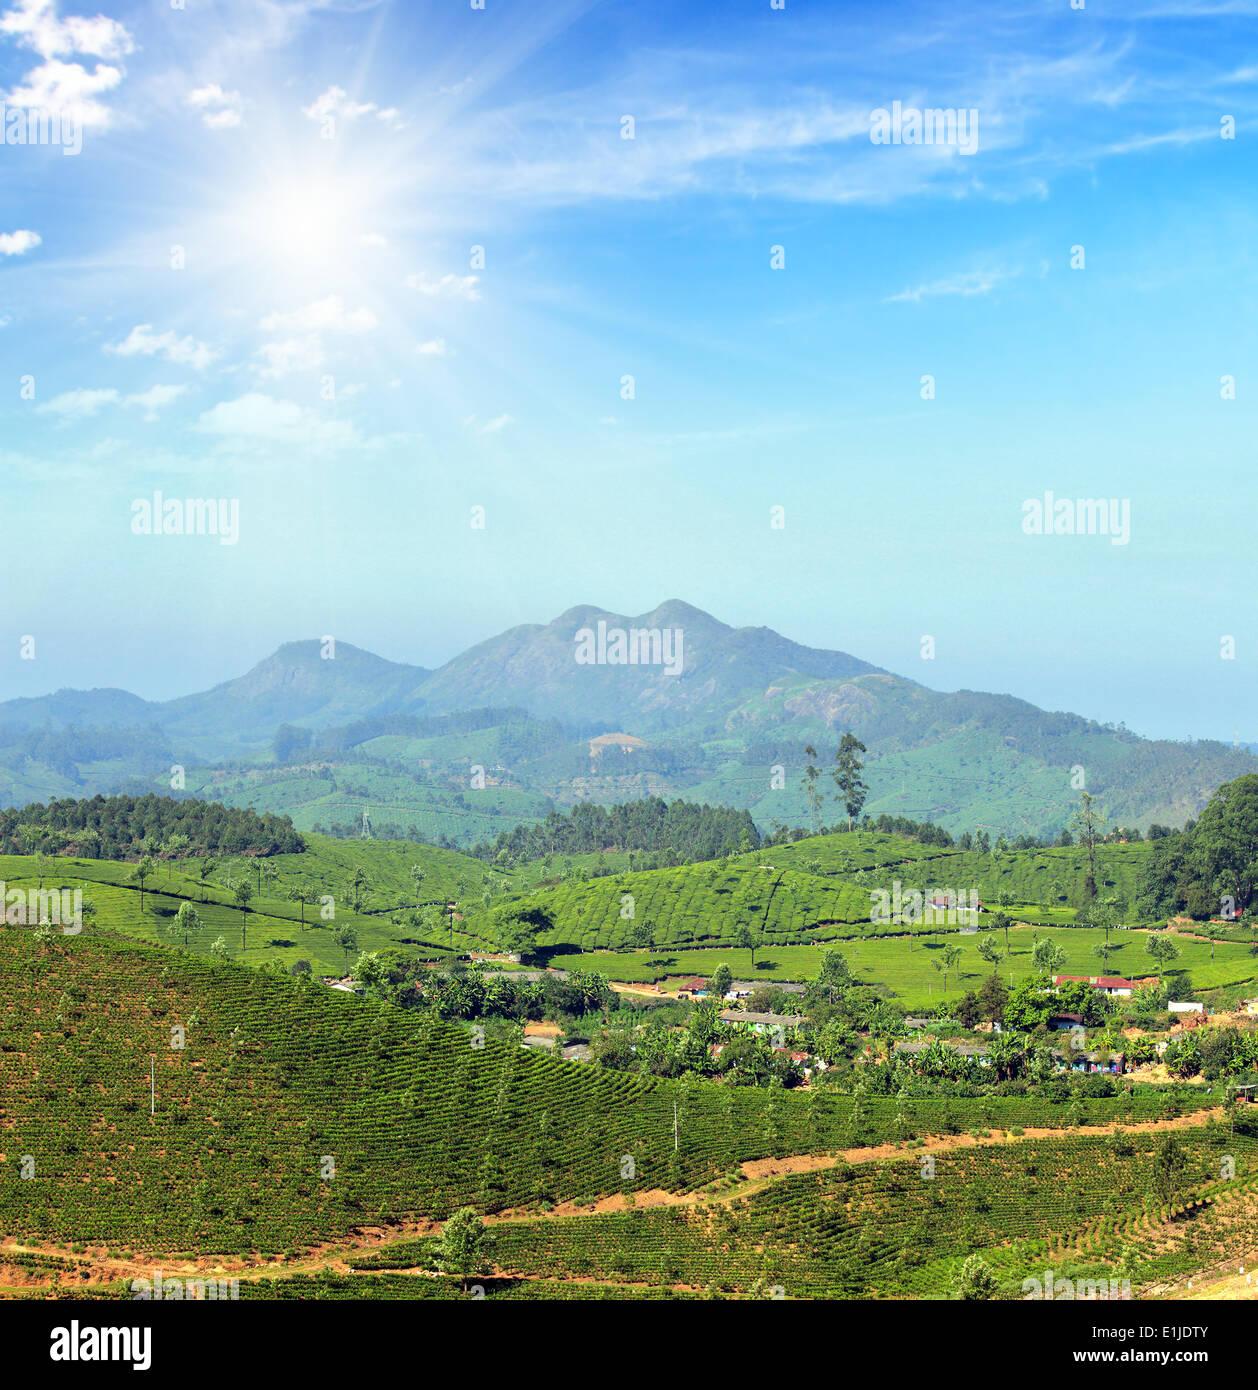 mountain tea plantation landscape in India - Stock Image